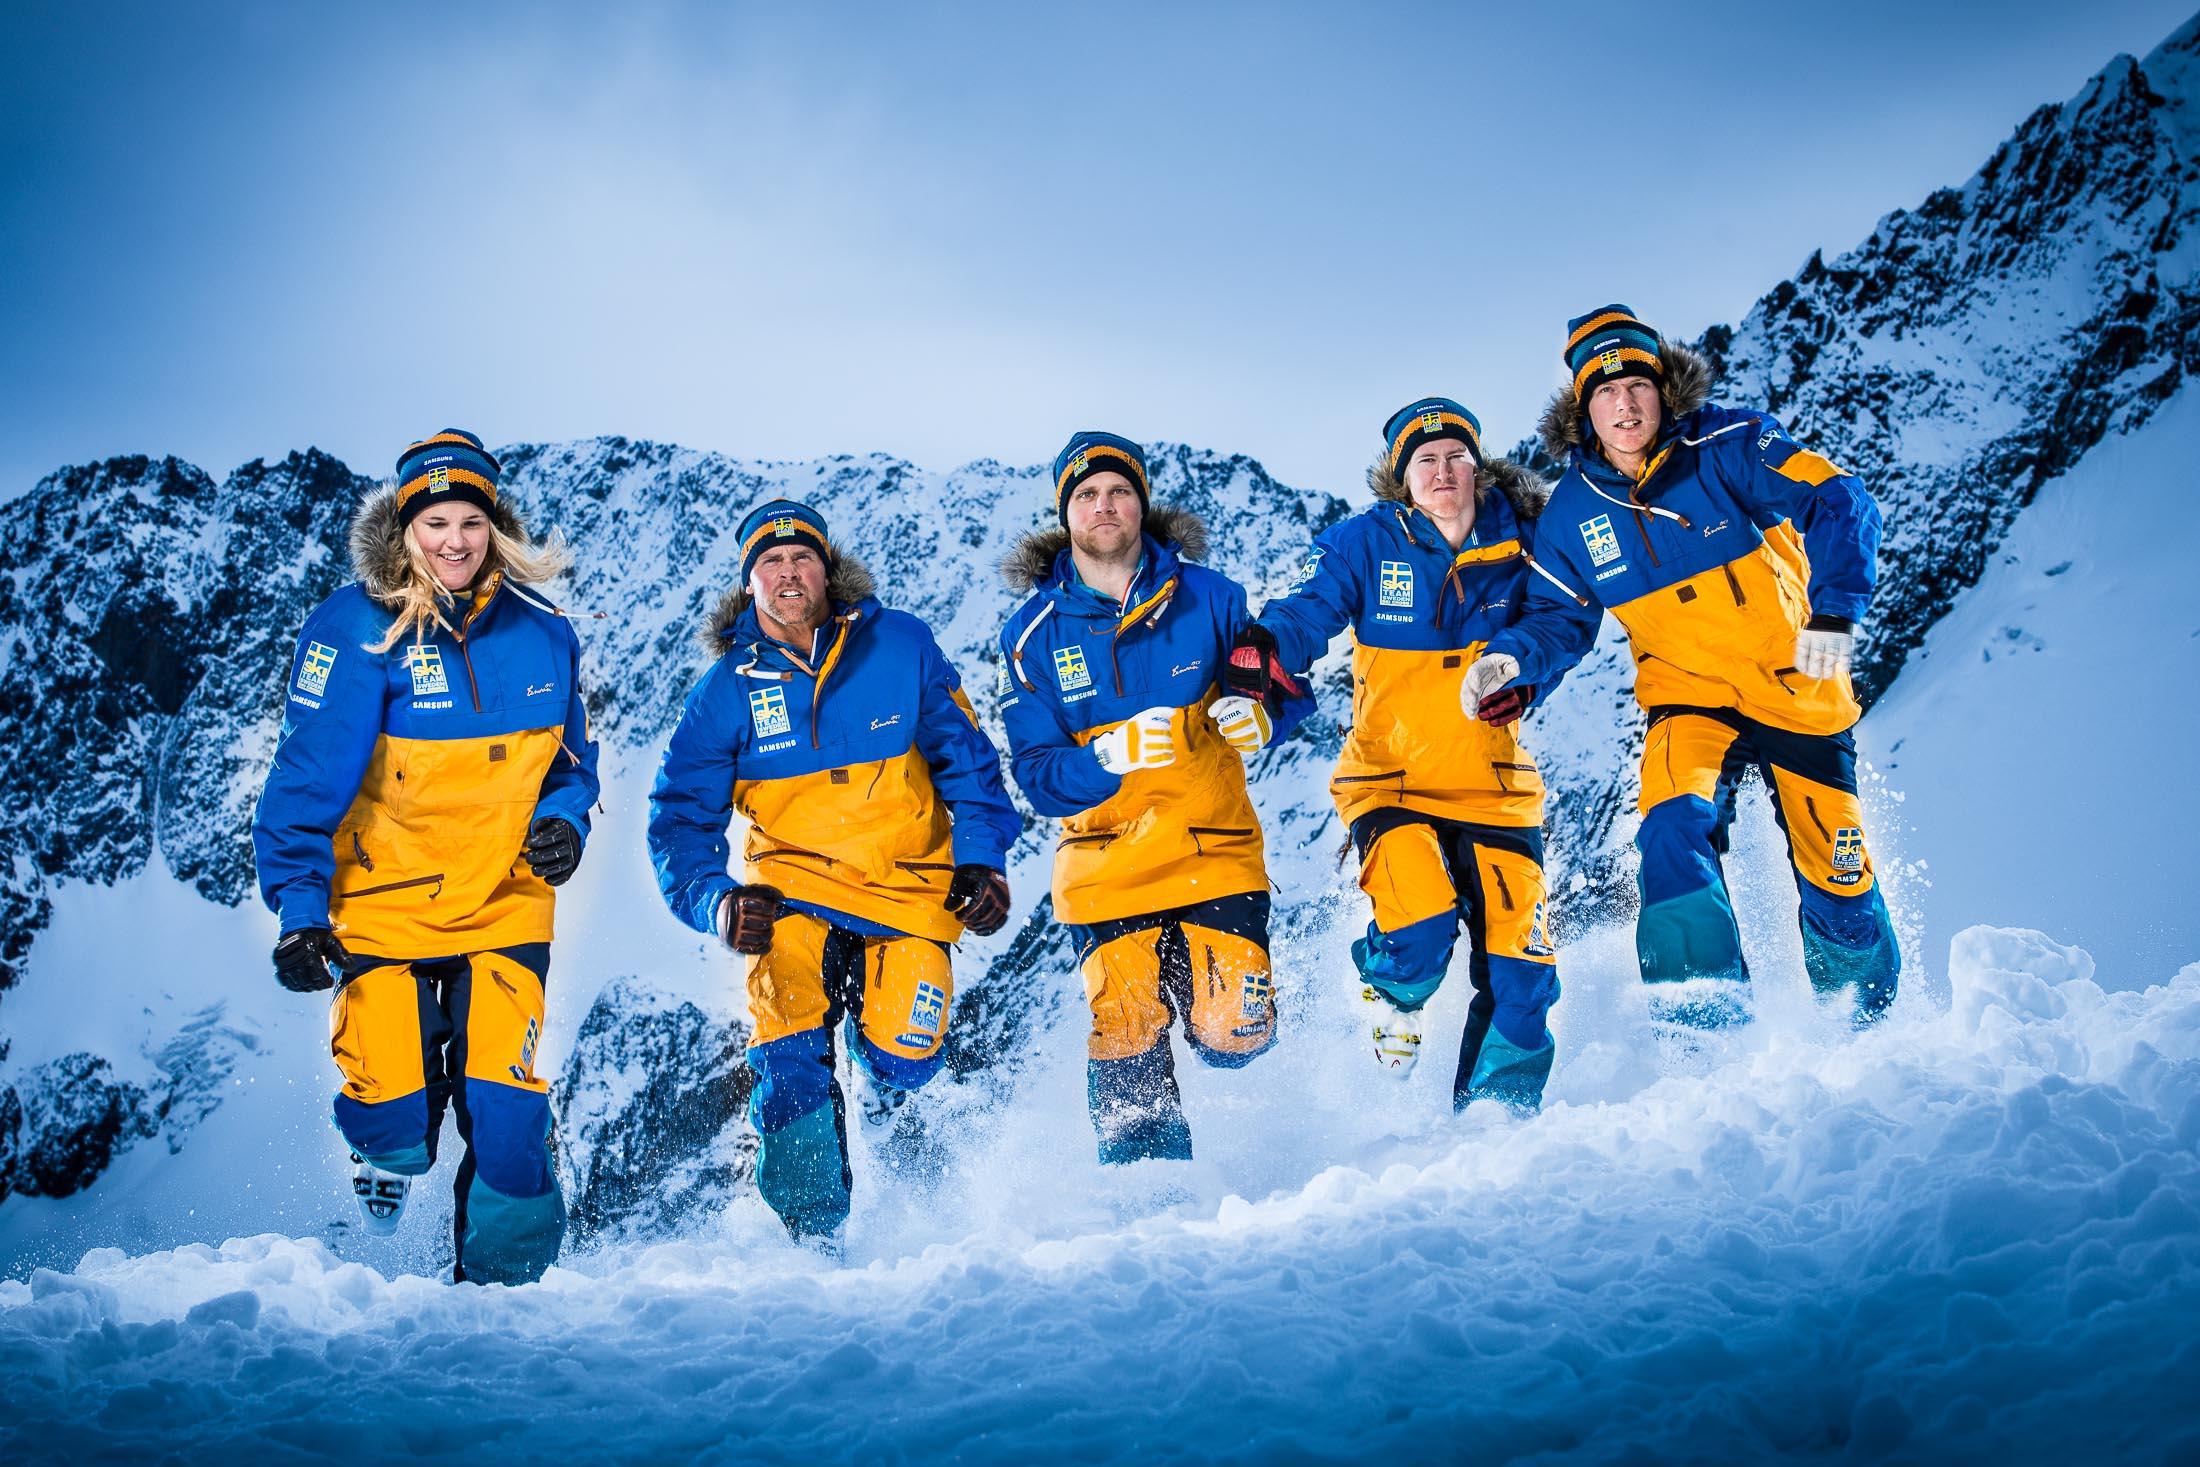 SKI TEAM SKICROSS SWEDEN - Officiella lagbilder till skicrosslandslaget.